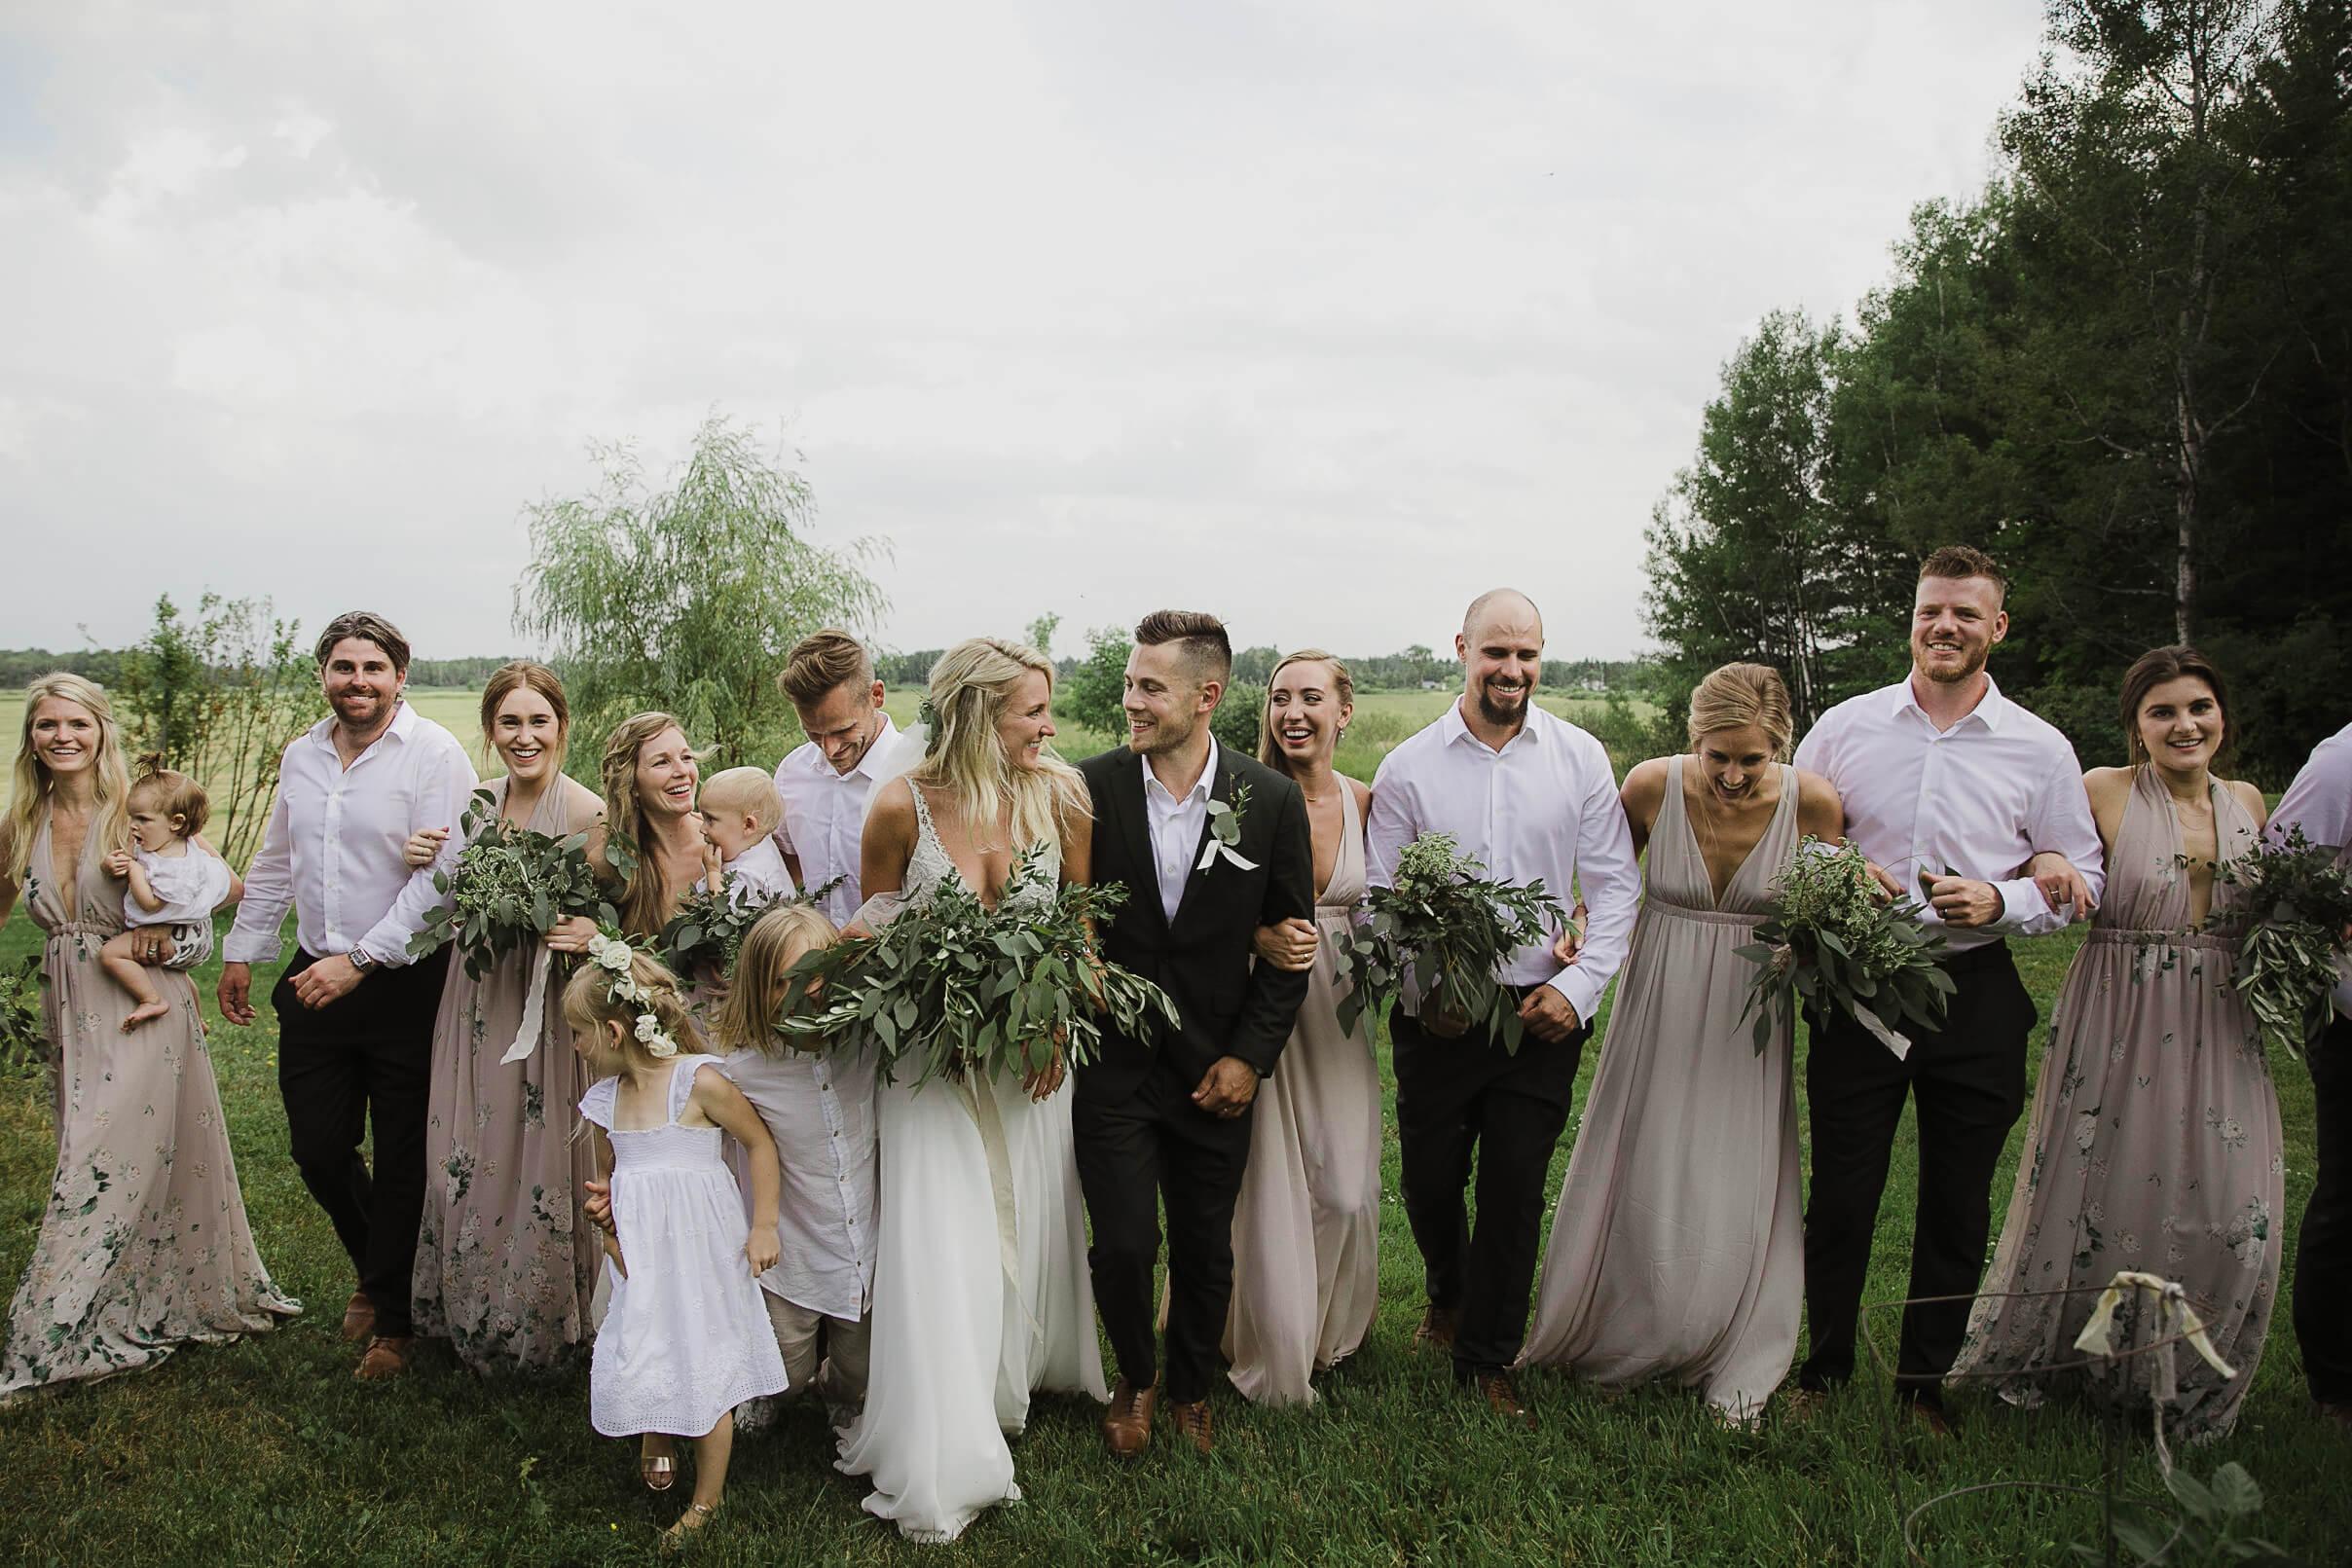 Wedding photo bridal party walking eucalyptus bouquets neutral tones bridesmaid dresses